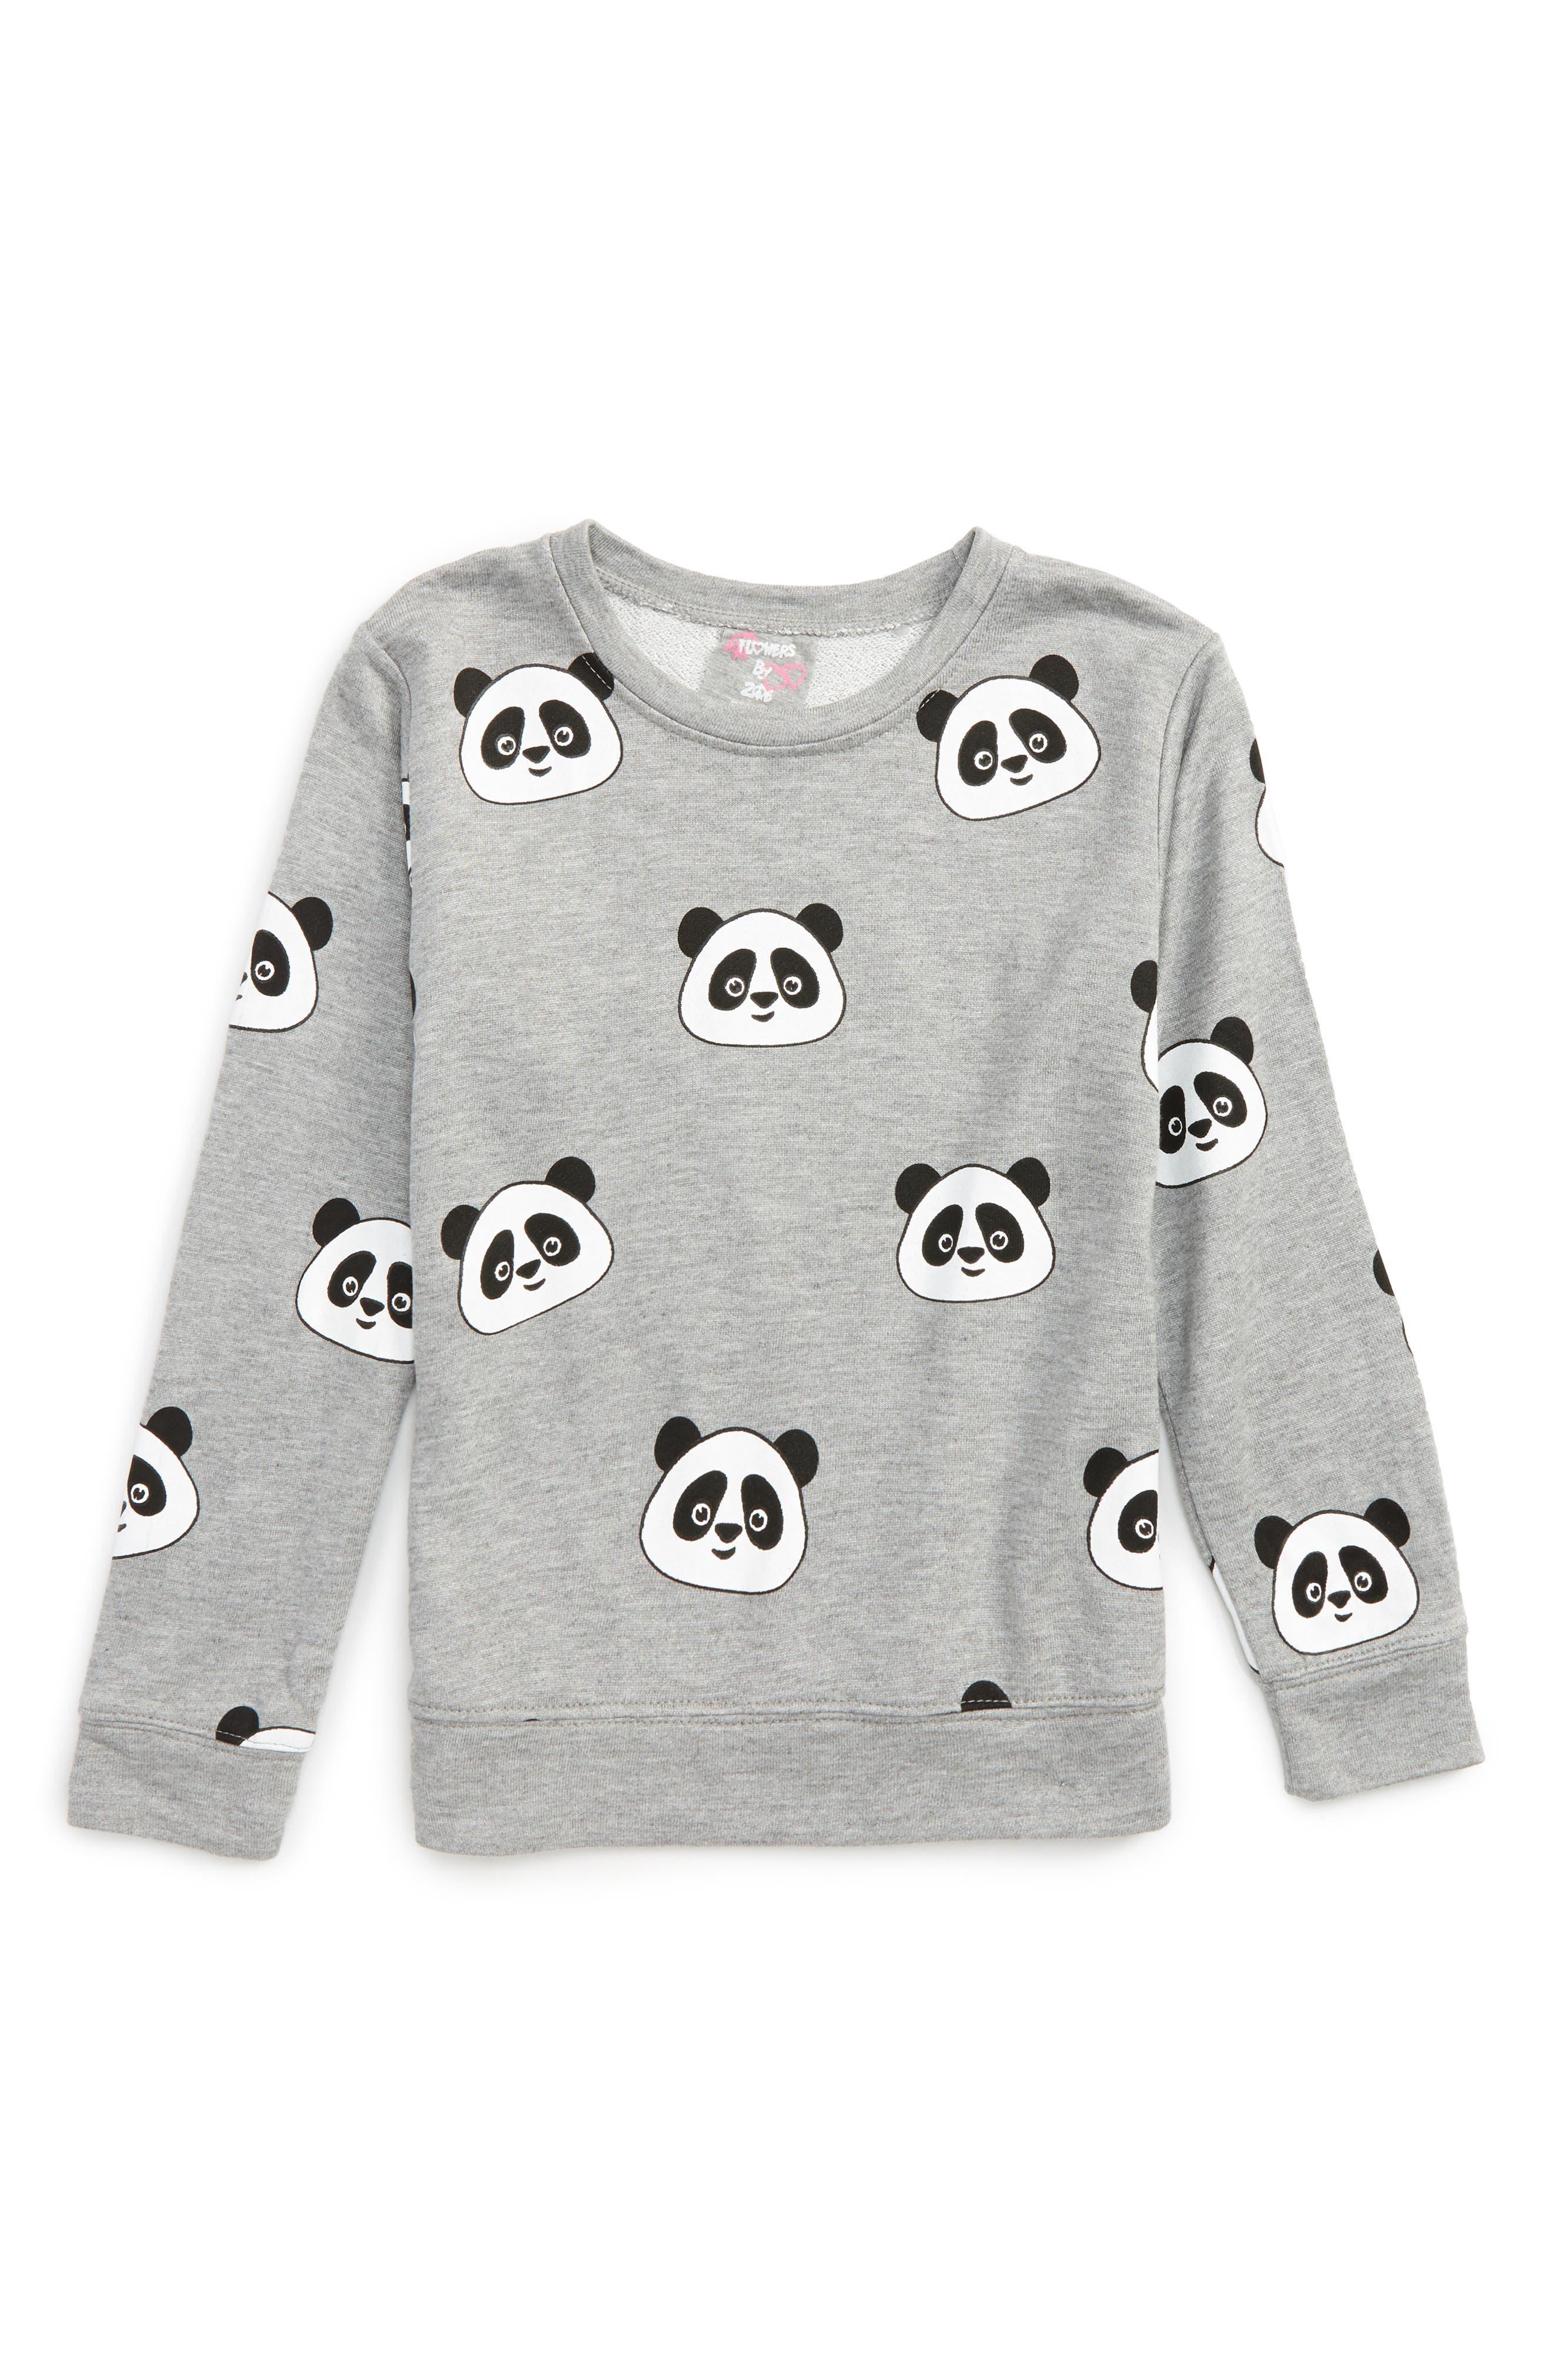 Main Image - Flowers by Zoe All Over Panda Sweatshirt (Little Girls & Big Girls)